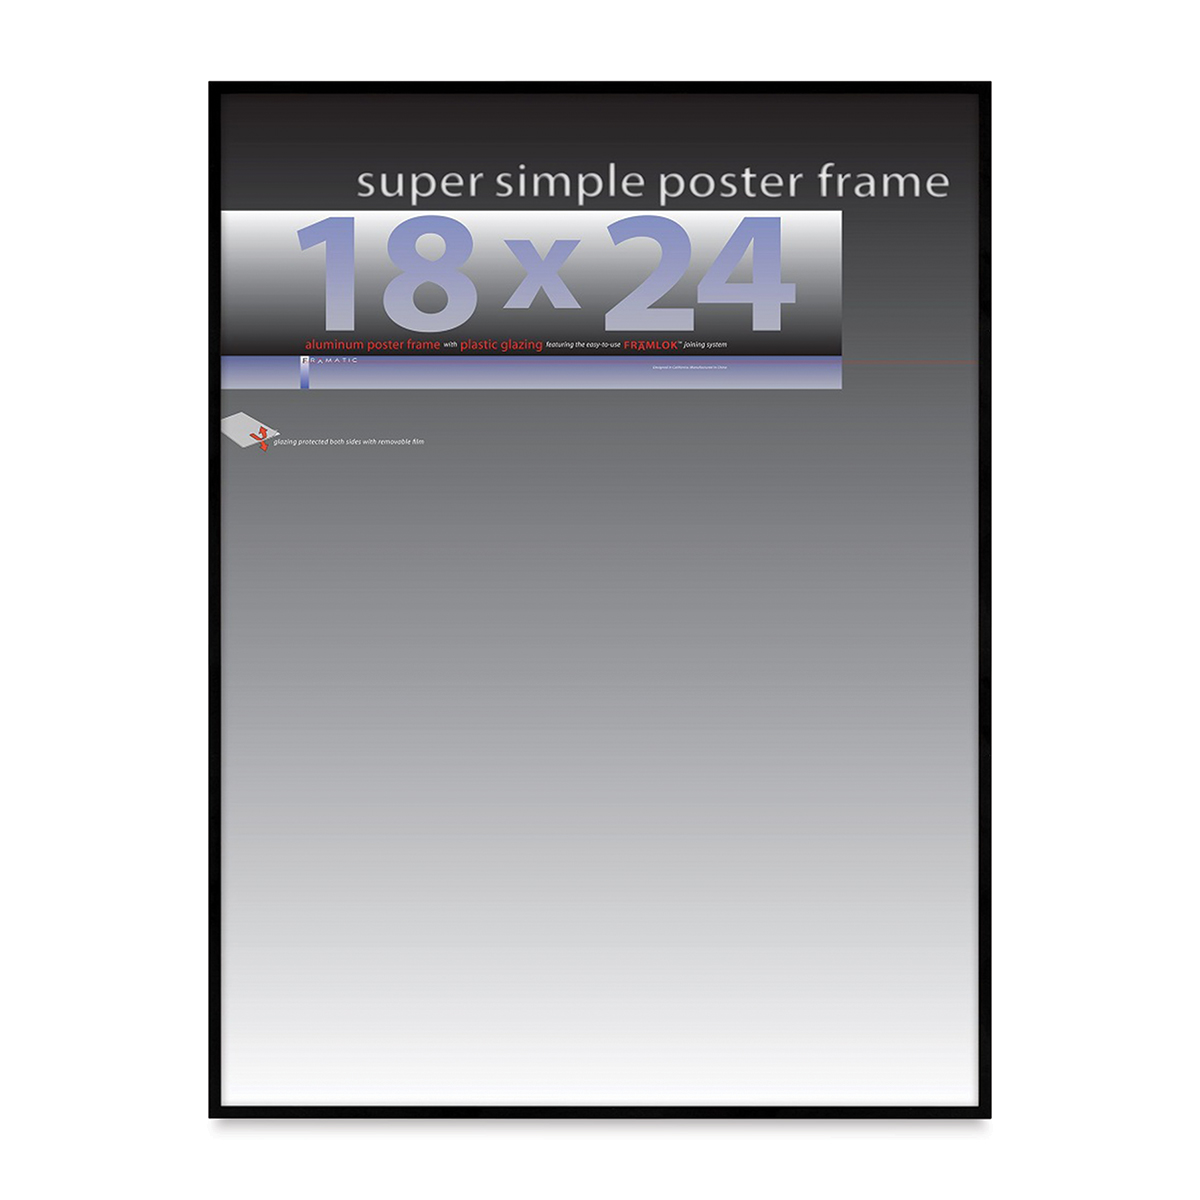 Framatic Super Simple Poster Frame - Black, 18 x 24